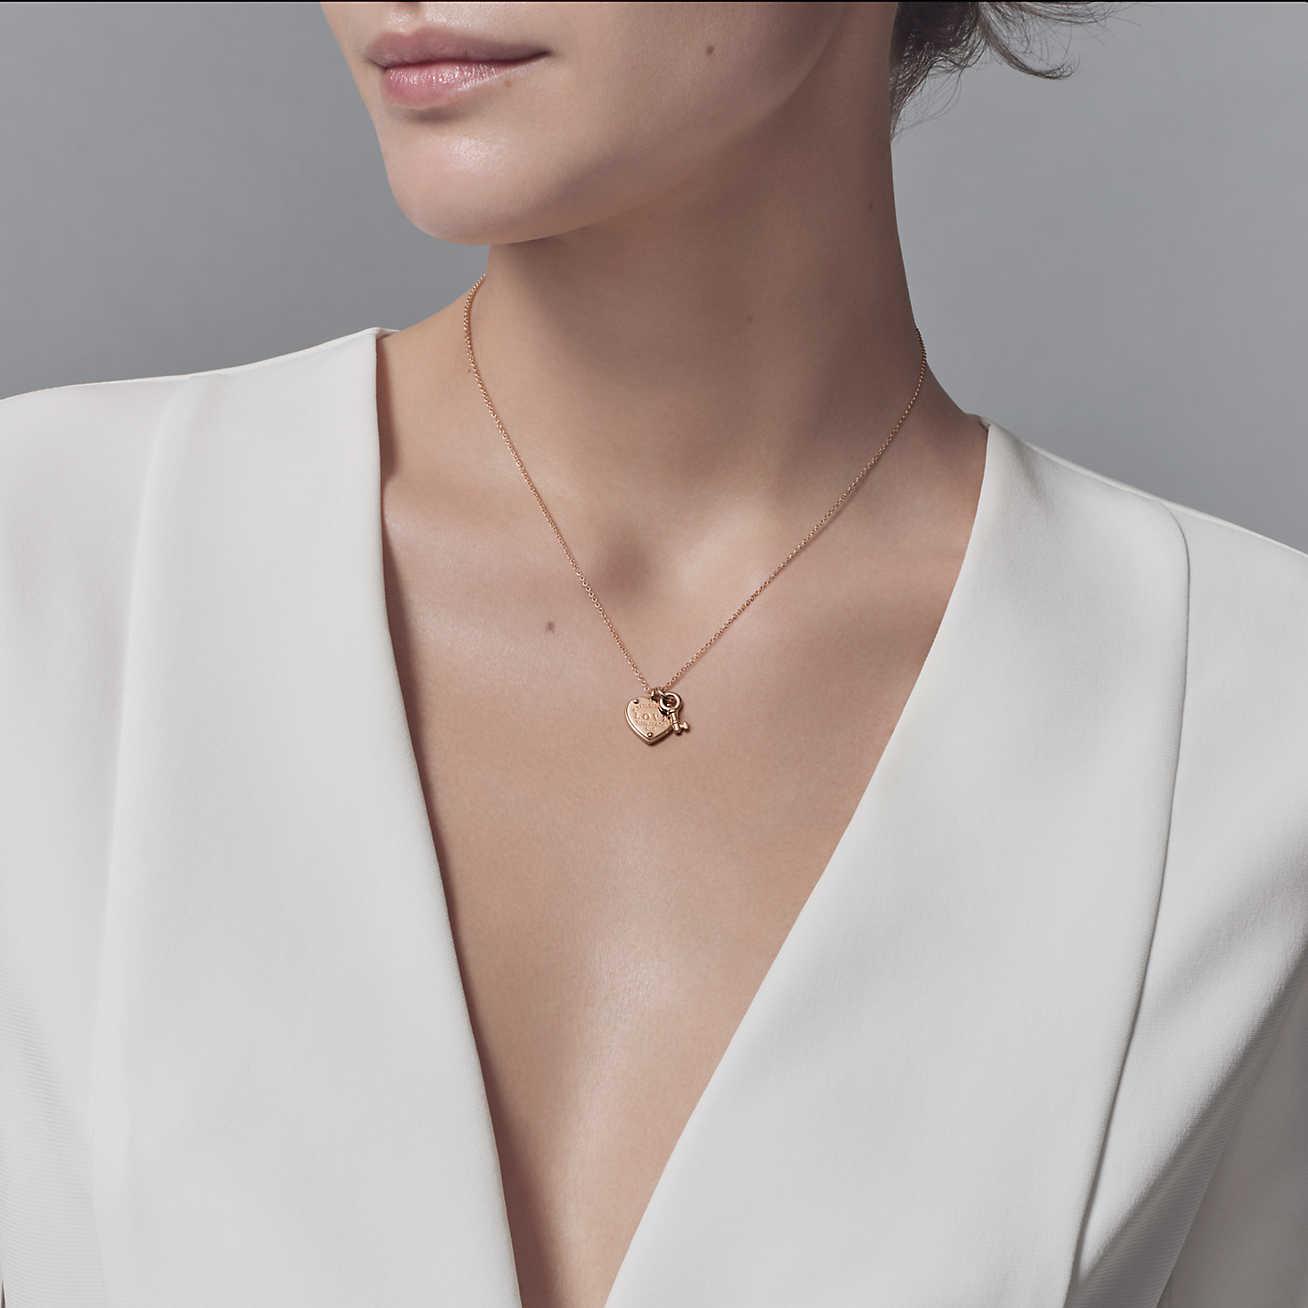 032b9c6f8 Tiffany & Co. Return To Tiffanytm Love Heart Tag Key Pendant In 18k ...